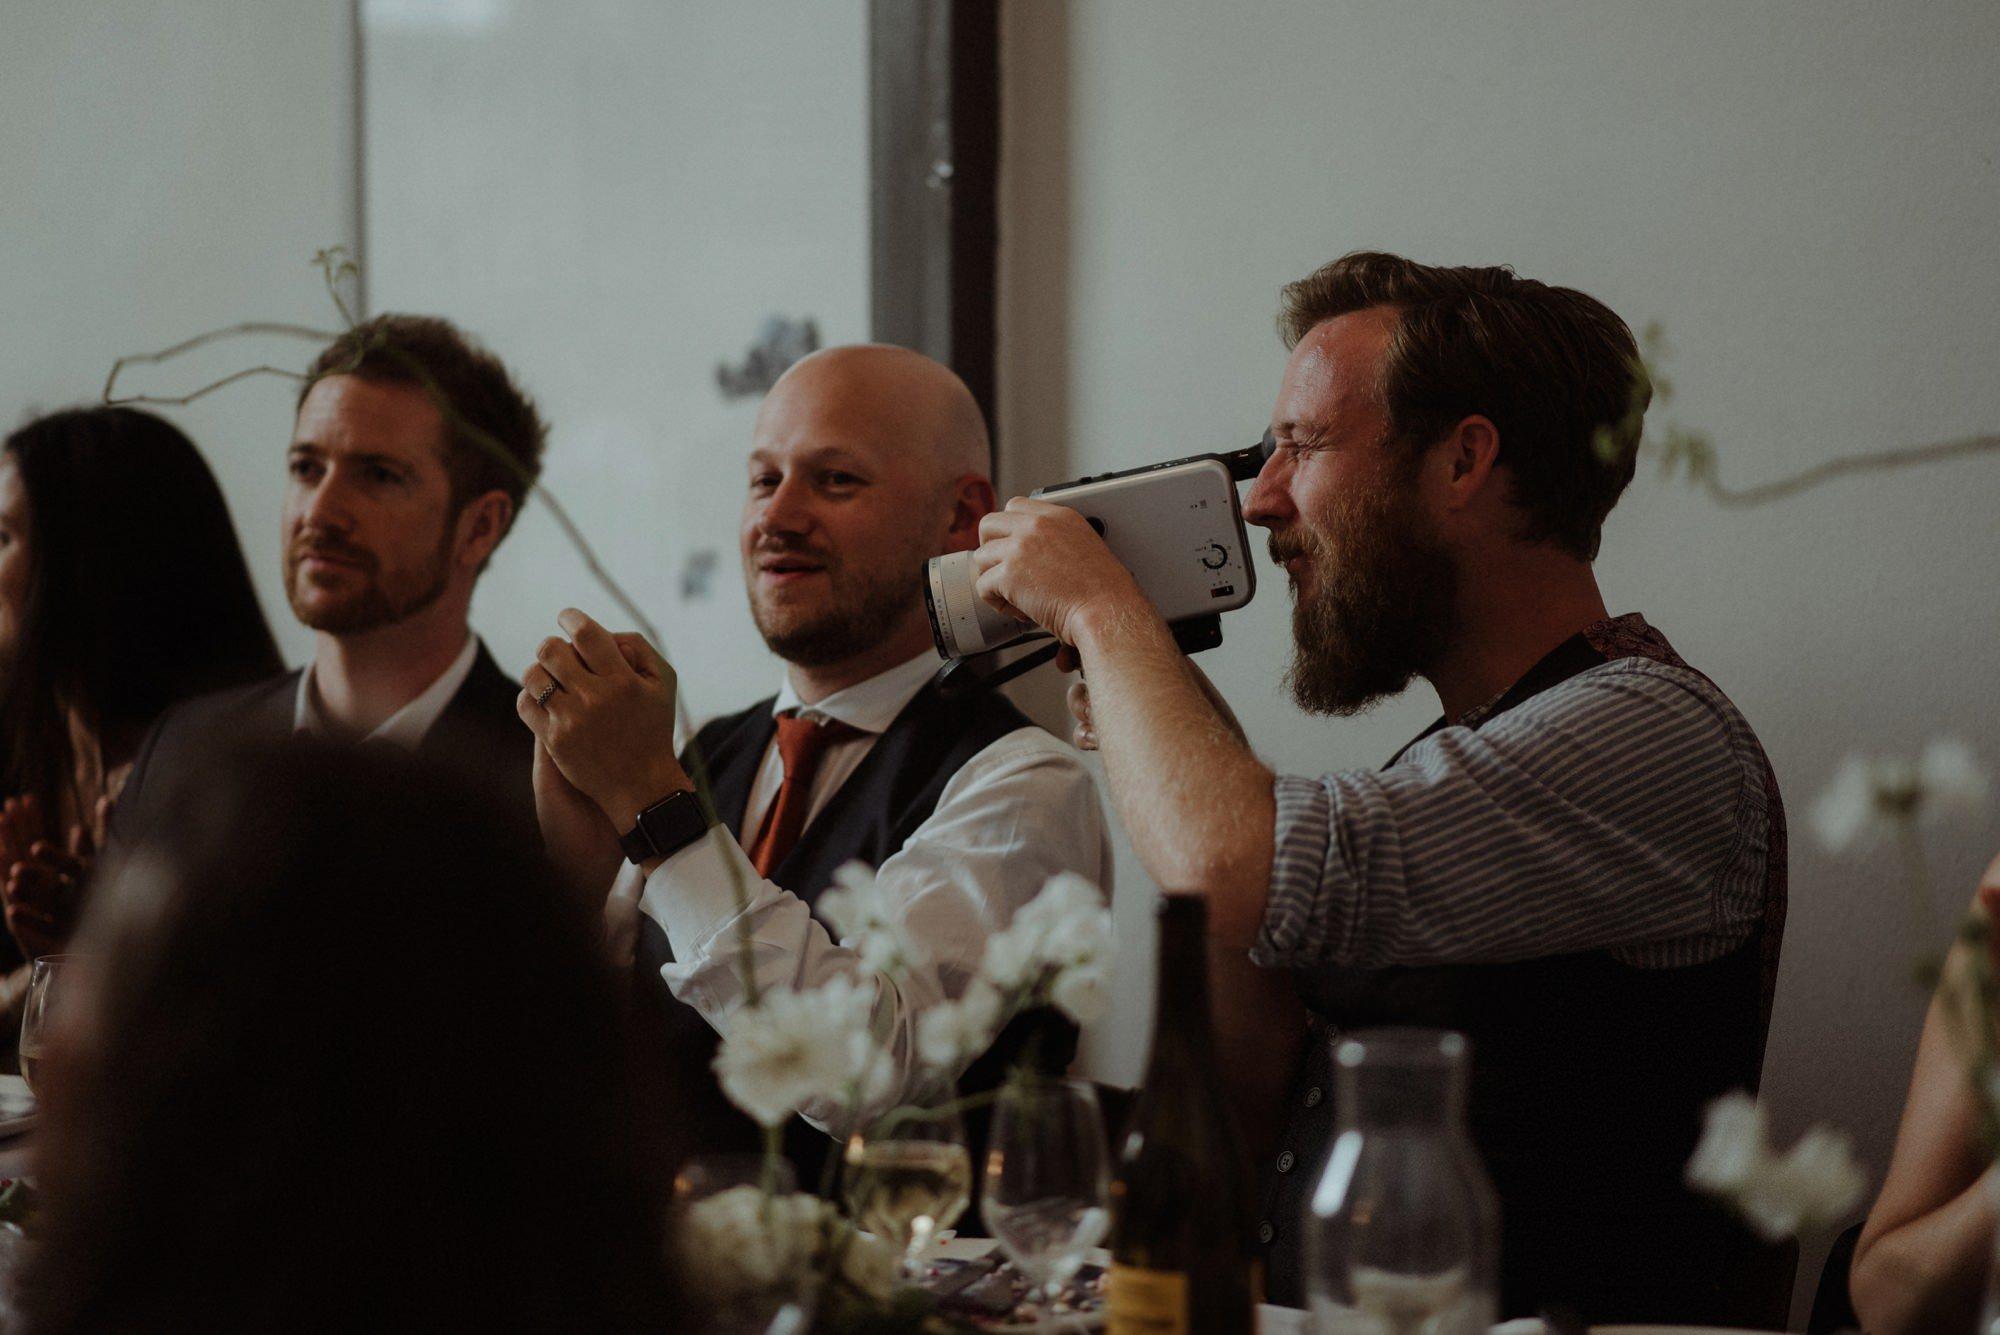 copenhagen wedding photography 0056 1